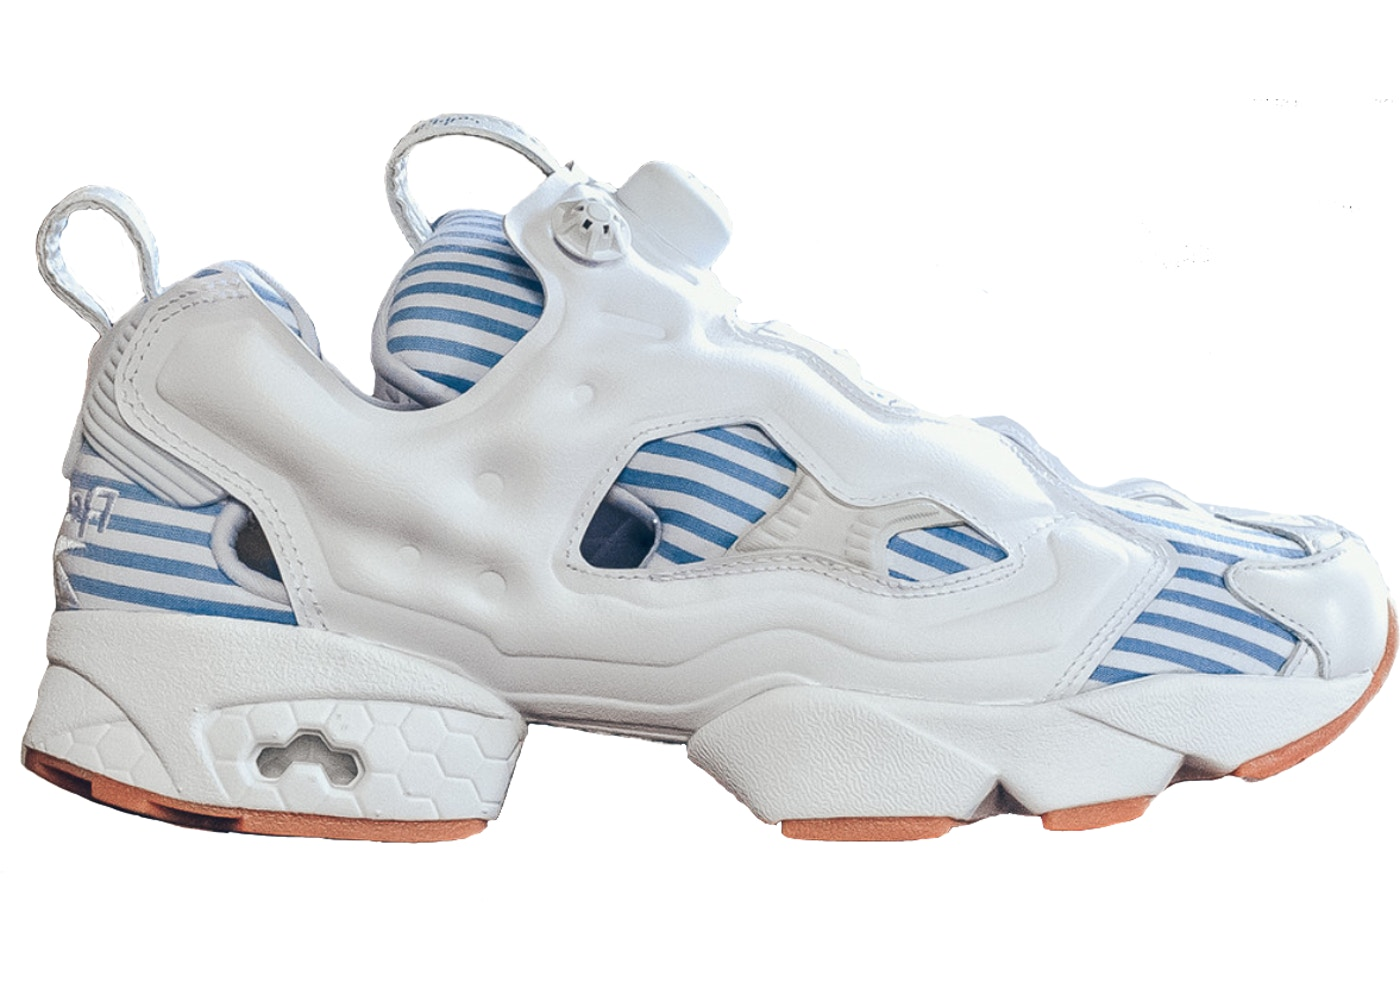 632aea3b57ac Sell. or Ask. Size  8.5. View All Bids. Reebok Instapump Fury Sneaker  Politics Seersucker